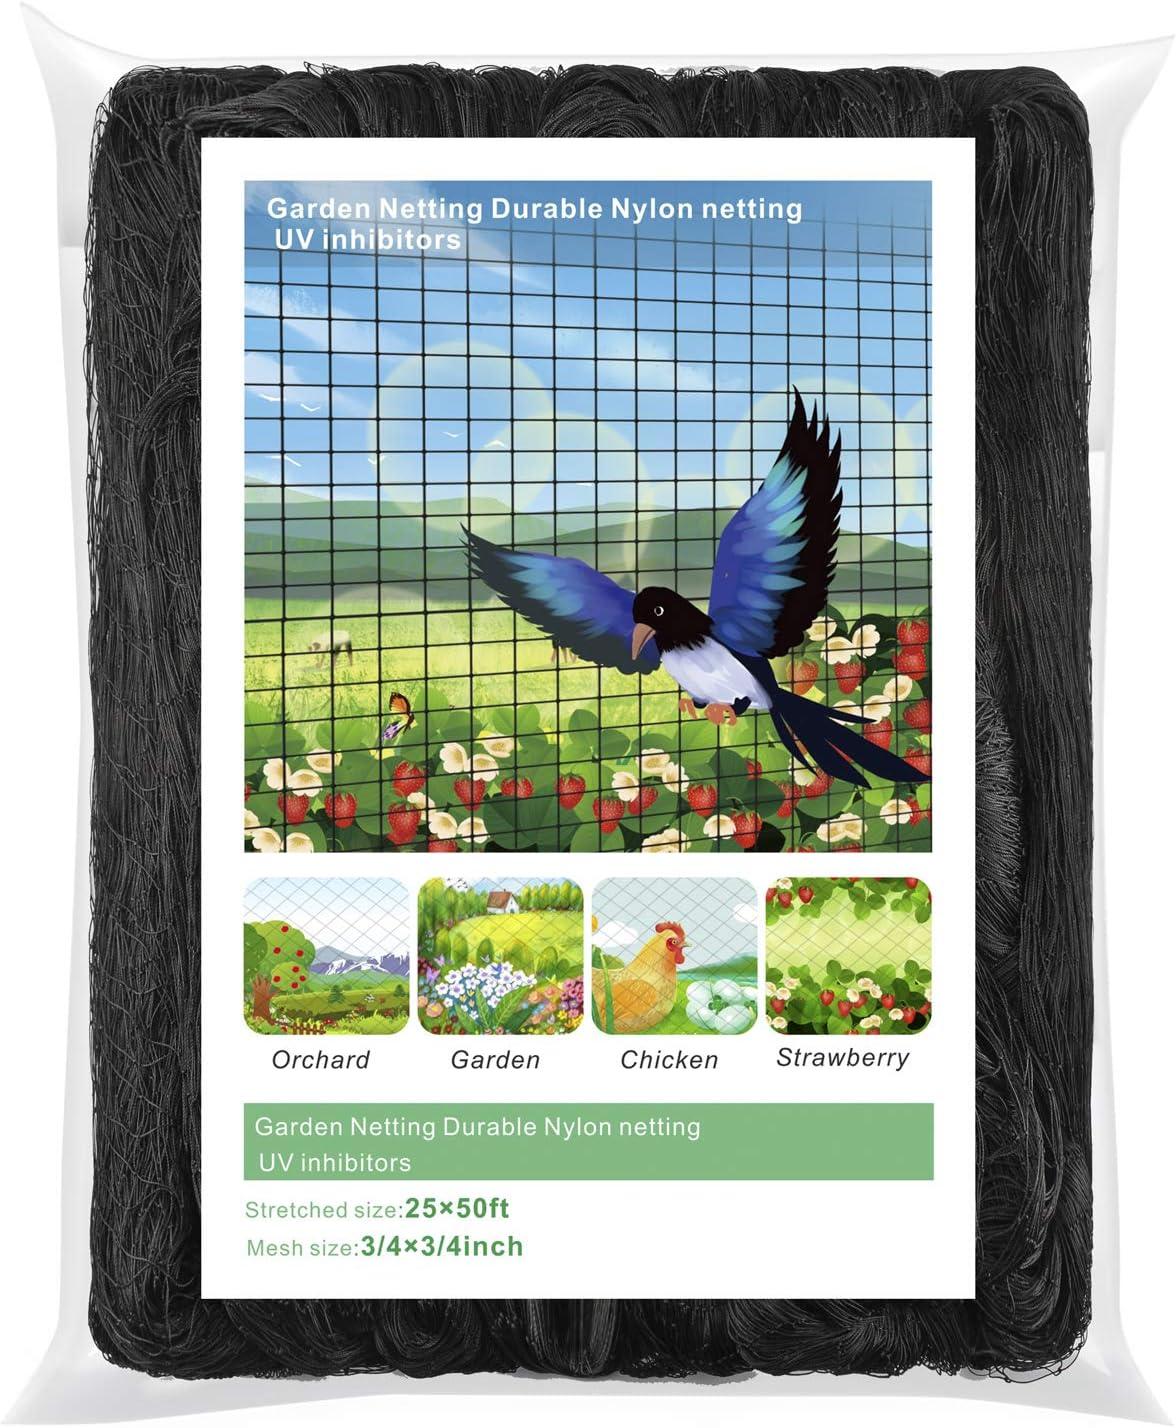 WOSCMI Bird Netting - 25 X 50 feet Garden Netting for Birds Tree Nets for Fruit Trees 3/4 inch Mesh Size Bird Netting for Garden